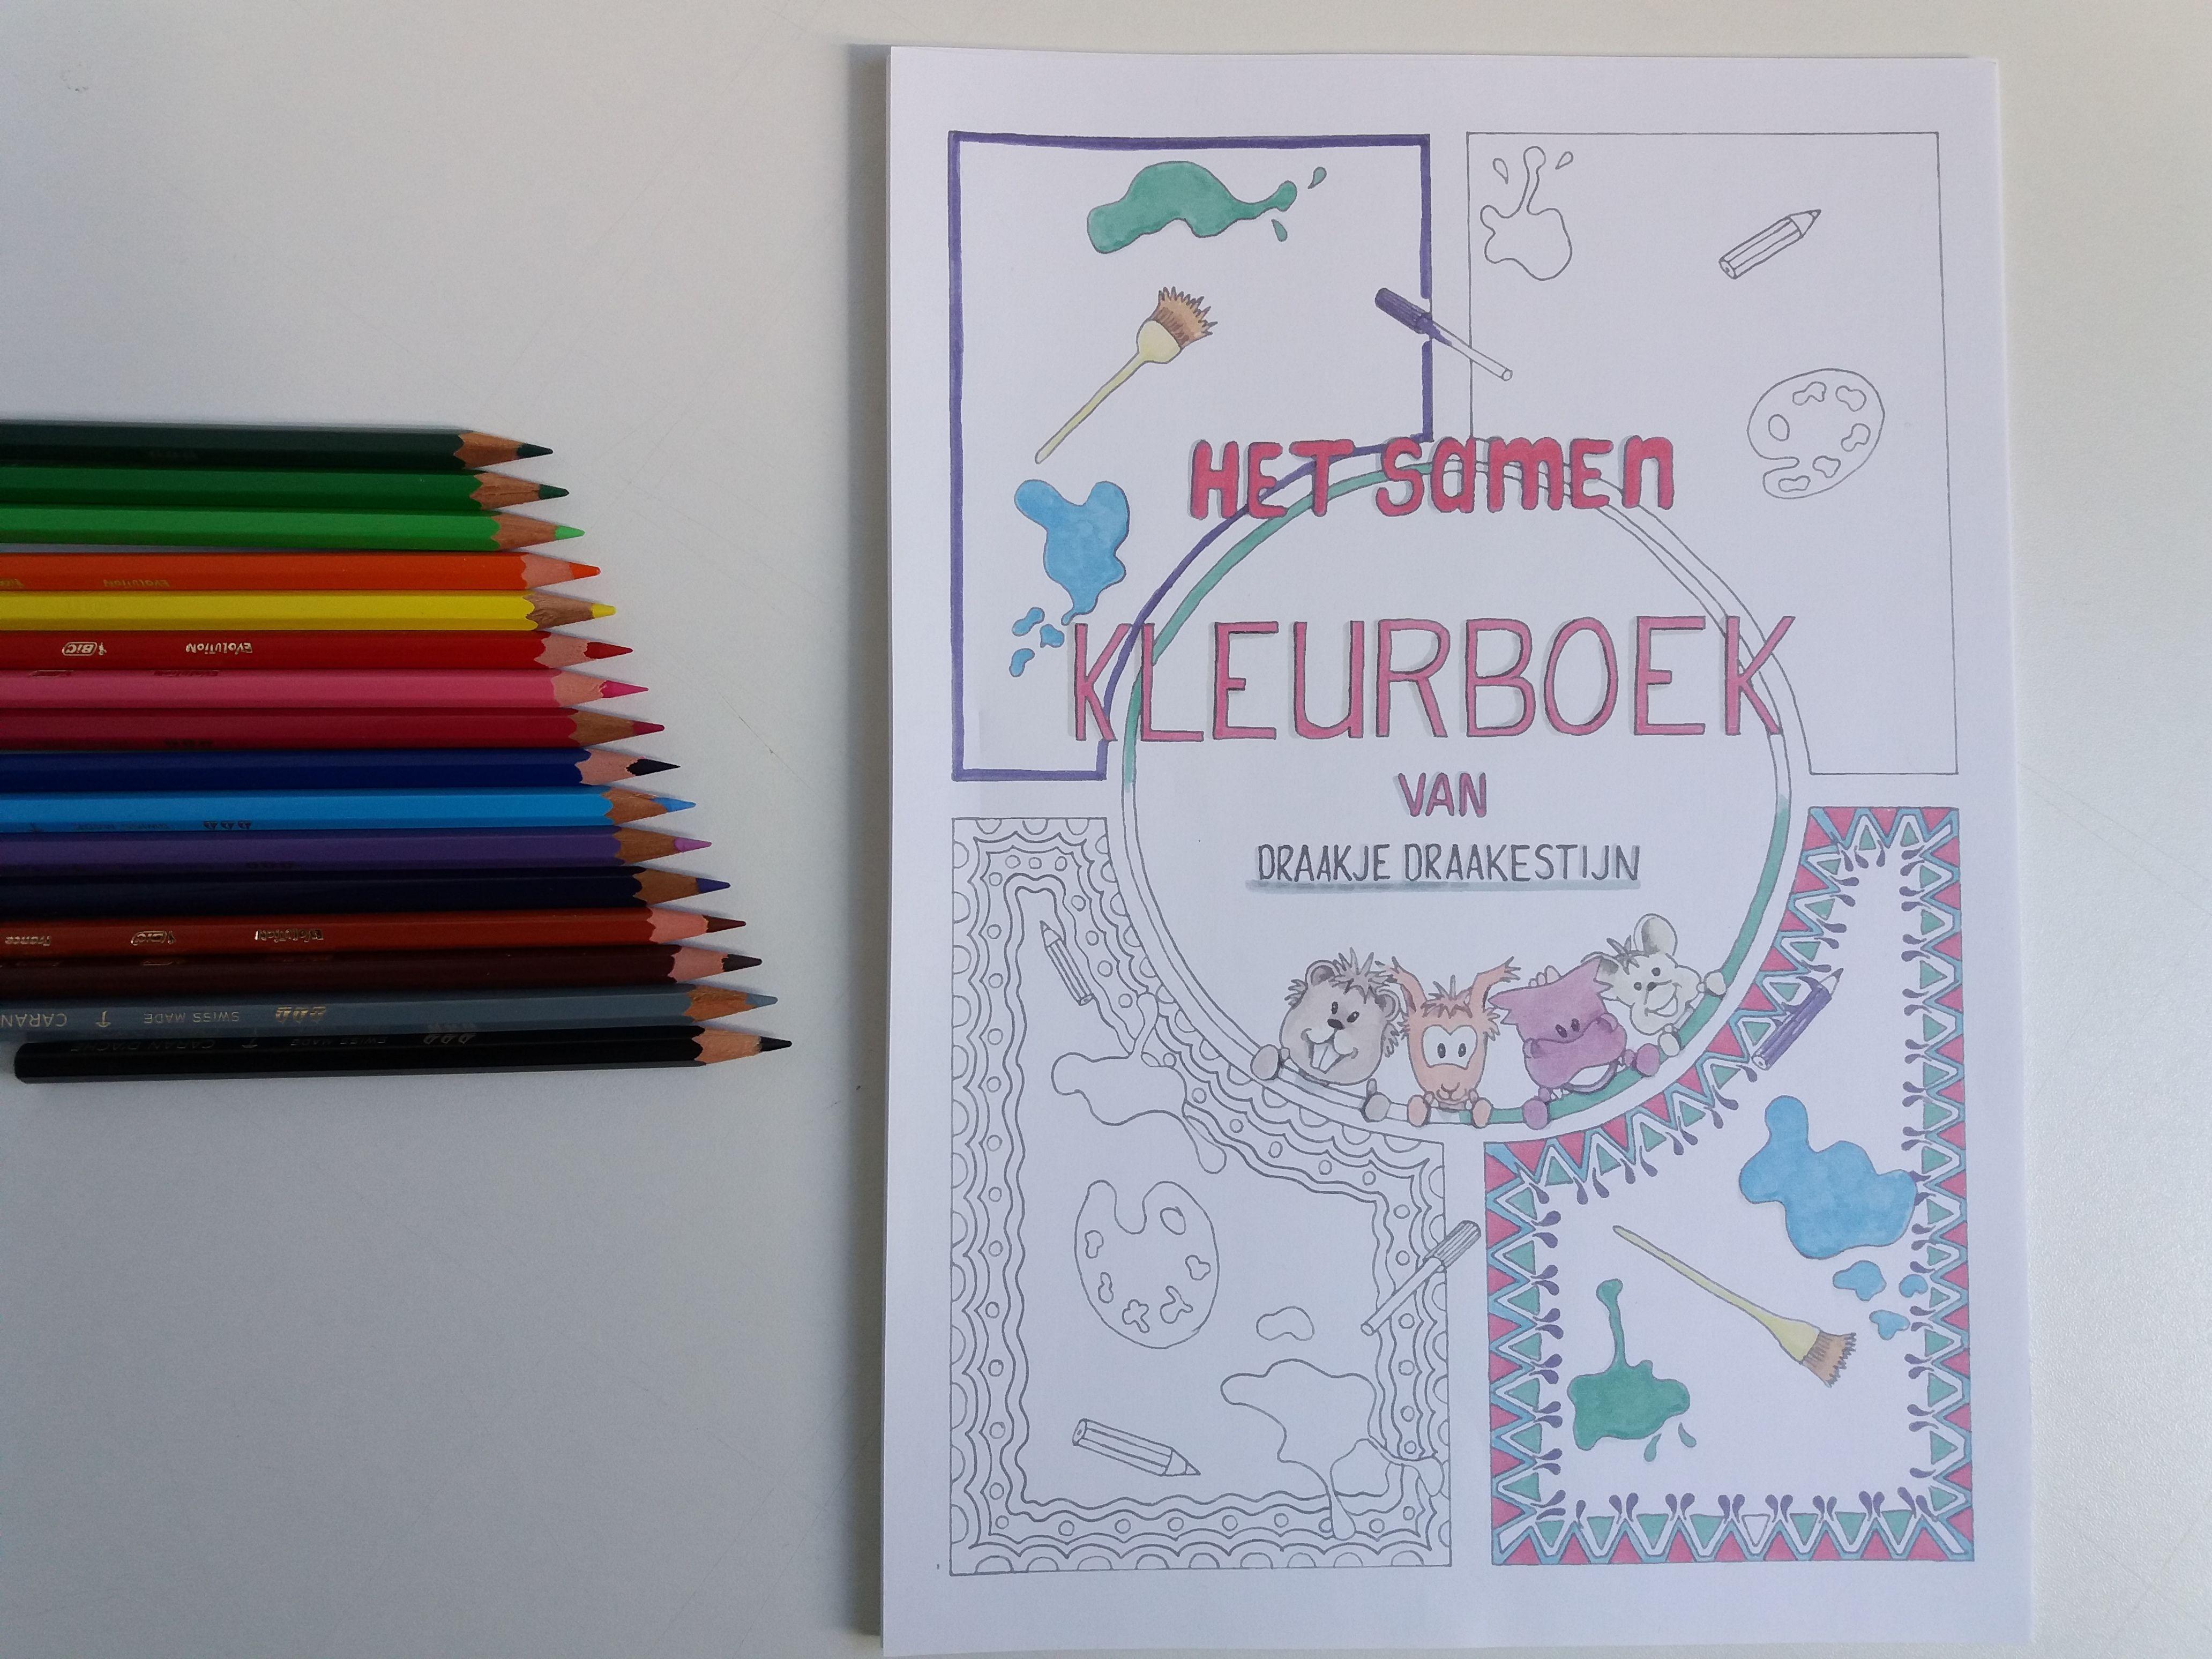 Pin Op Kinderboek Draakje Draakestijn